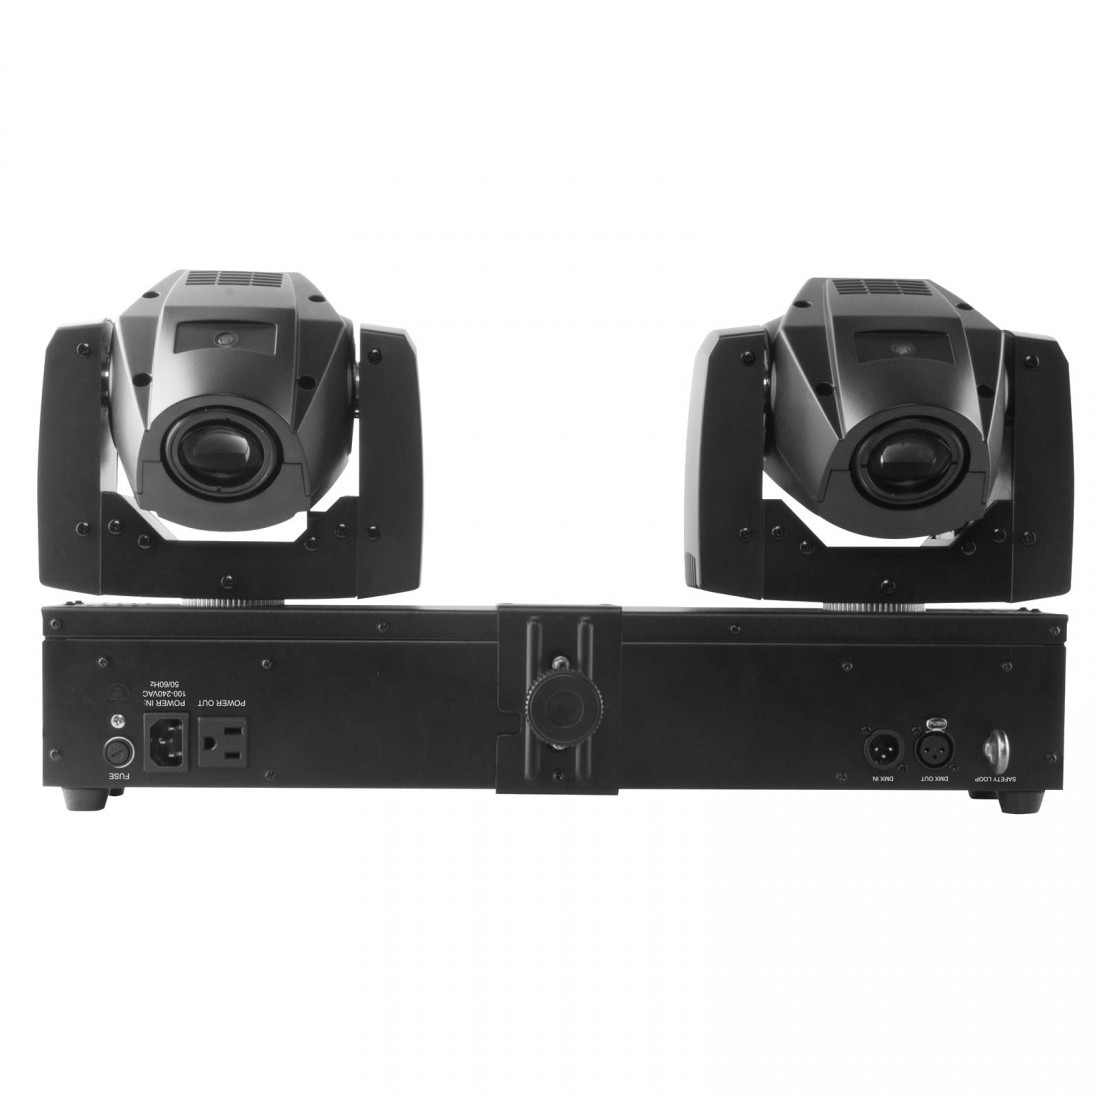 Chauvet Dj Intimidator Spot Duo 155 Package 2